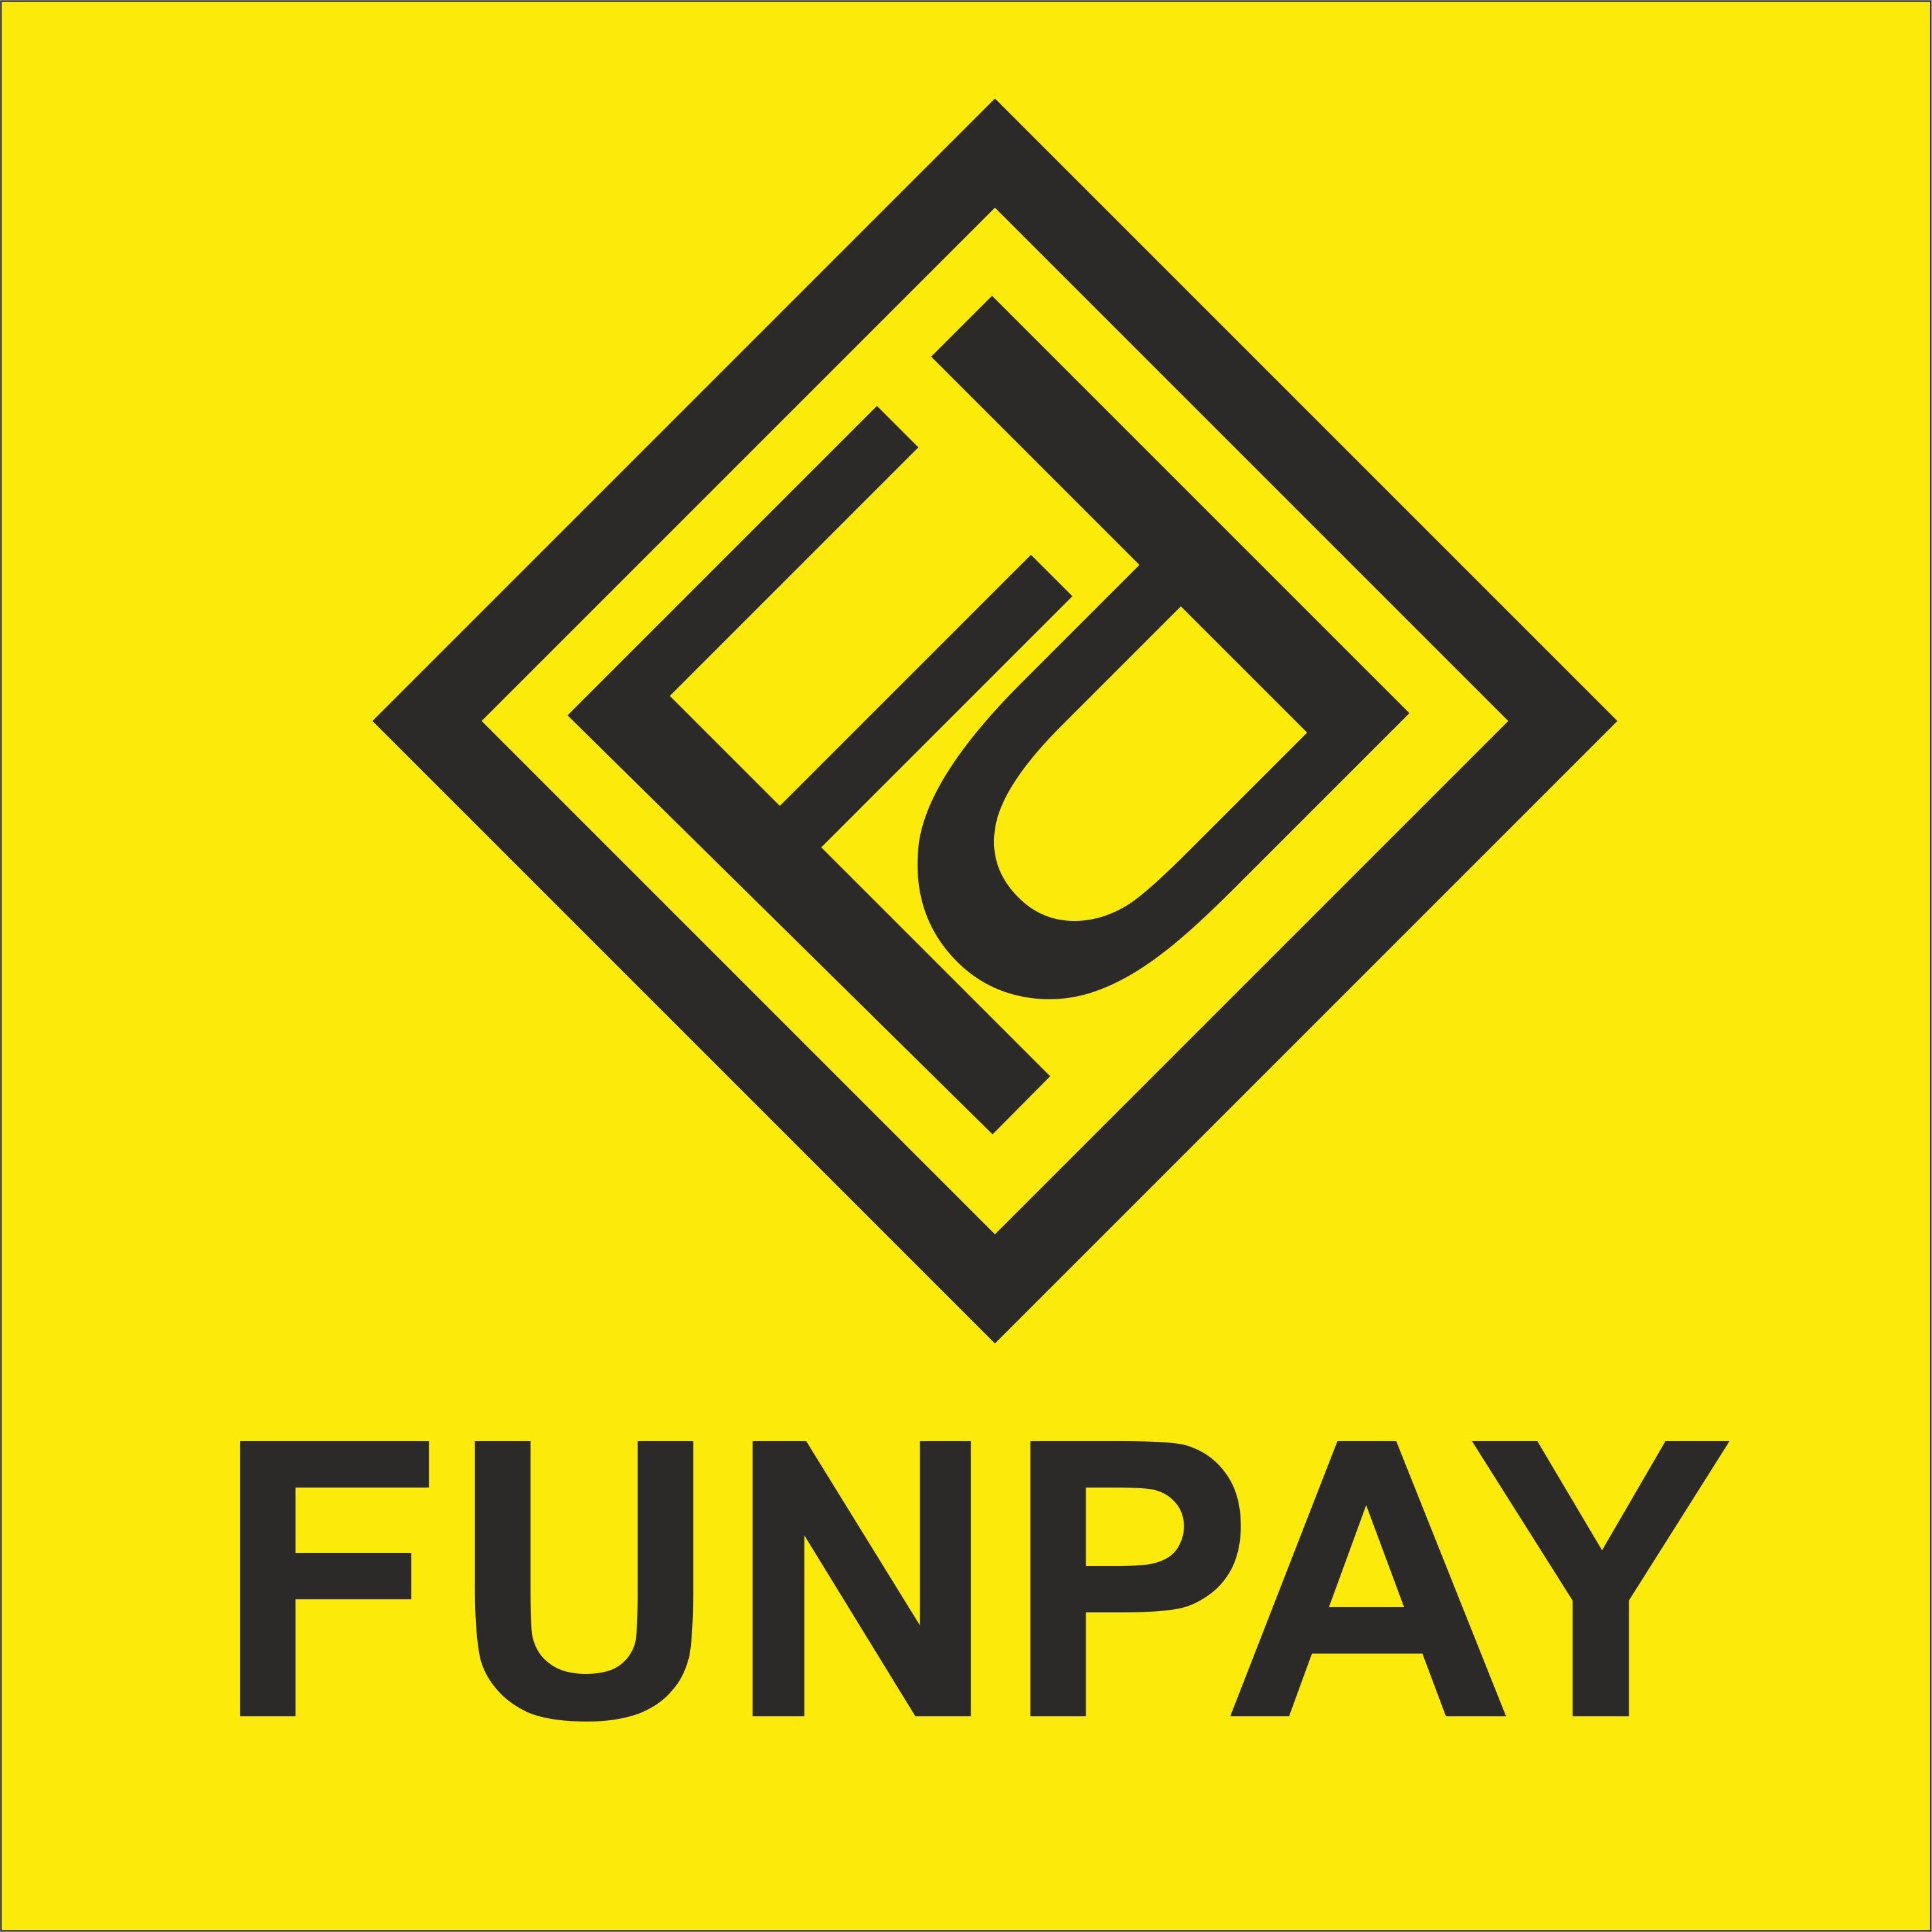 Логотип для FunPay.ru фото f_98259917569afe90.jpg